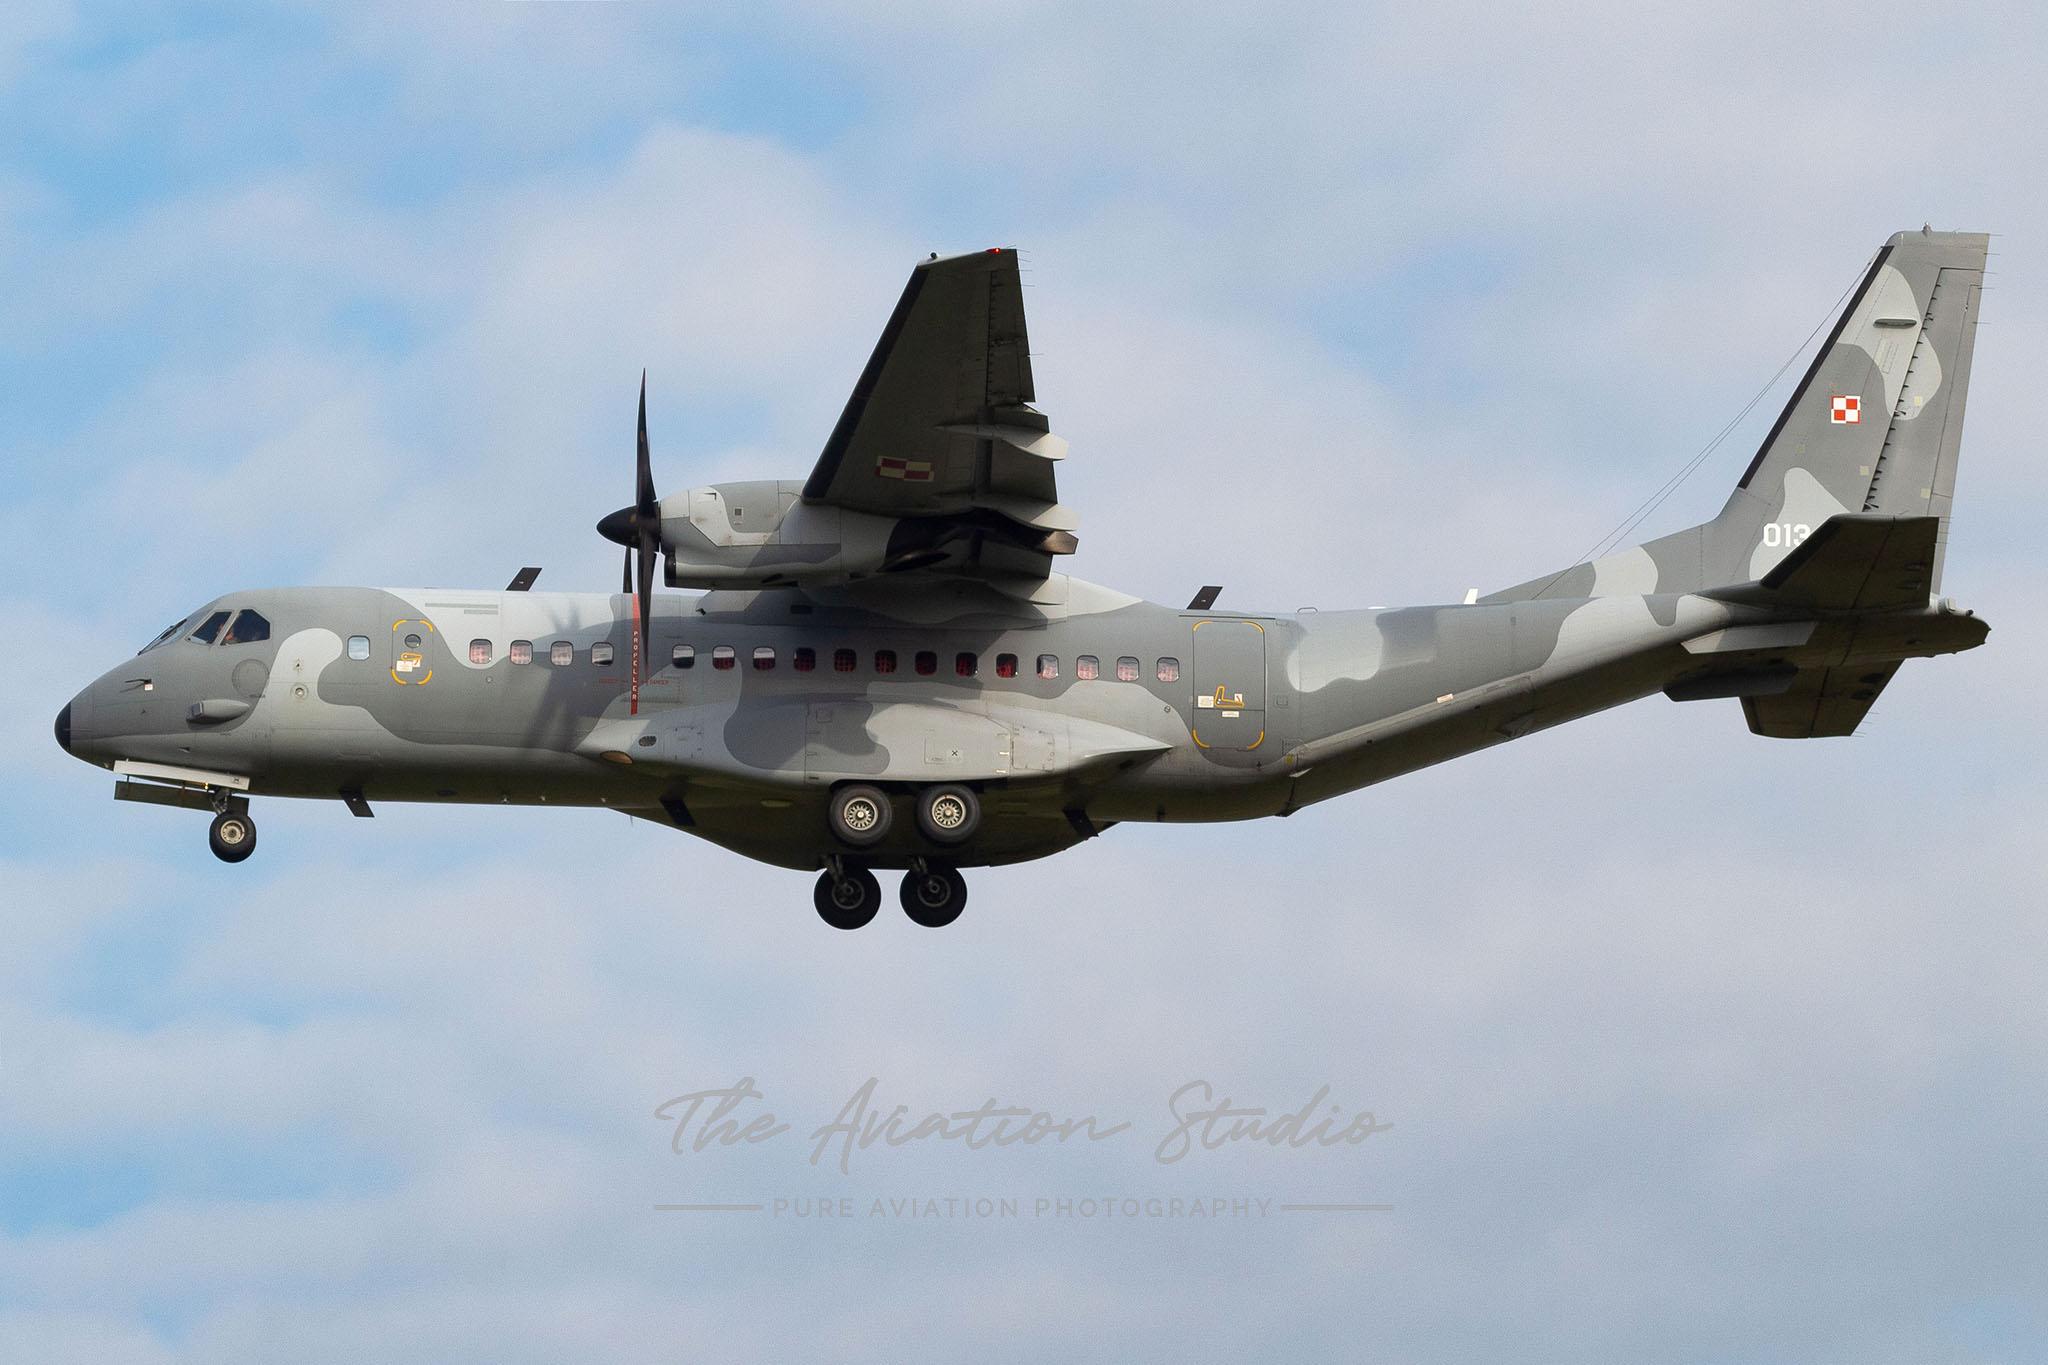 Polish Air Force CASA 295M 013 at Spottersday Kleine Brogel 2021